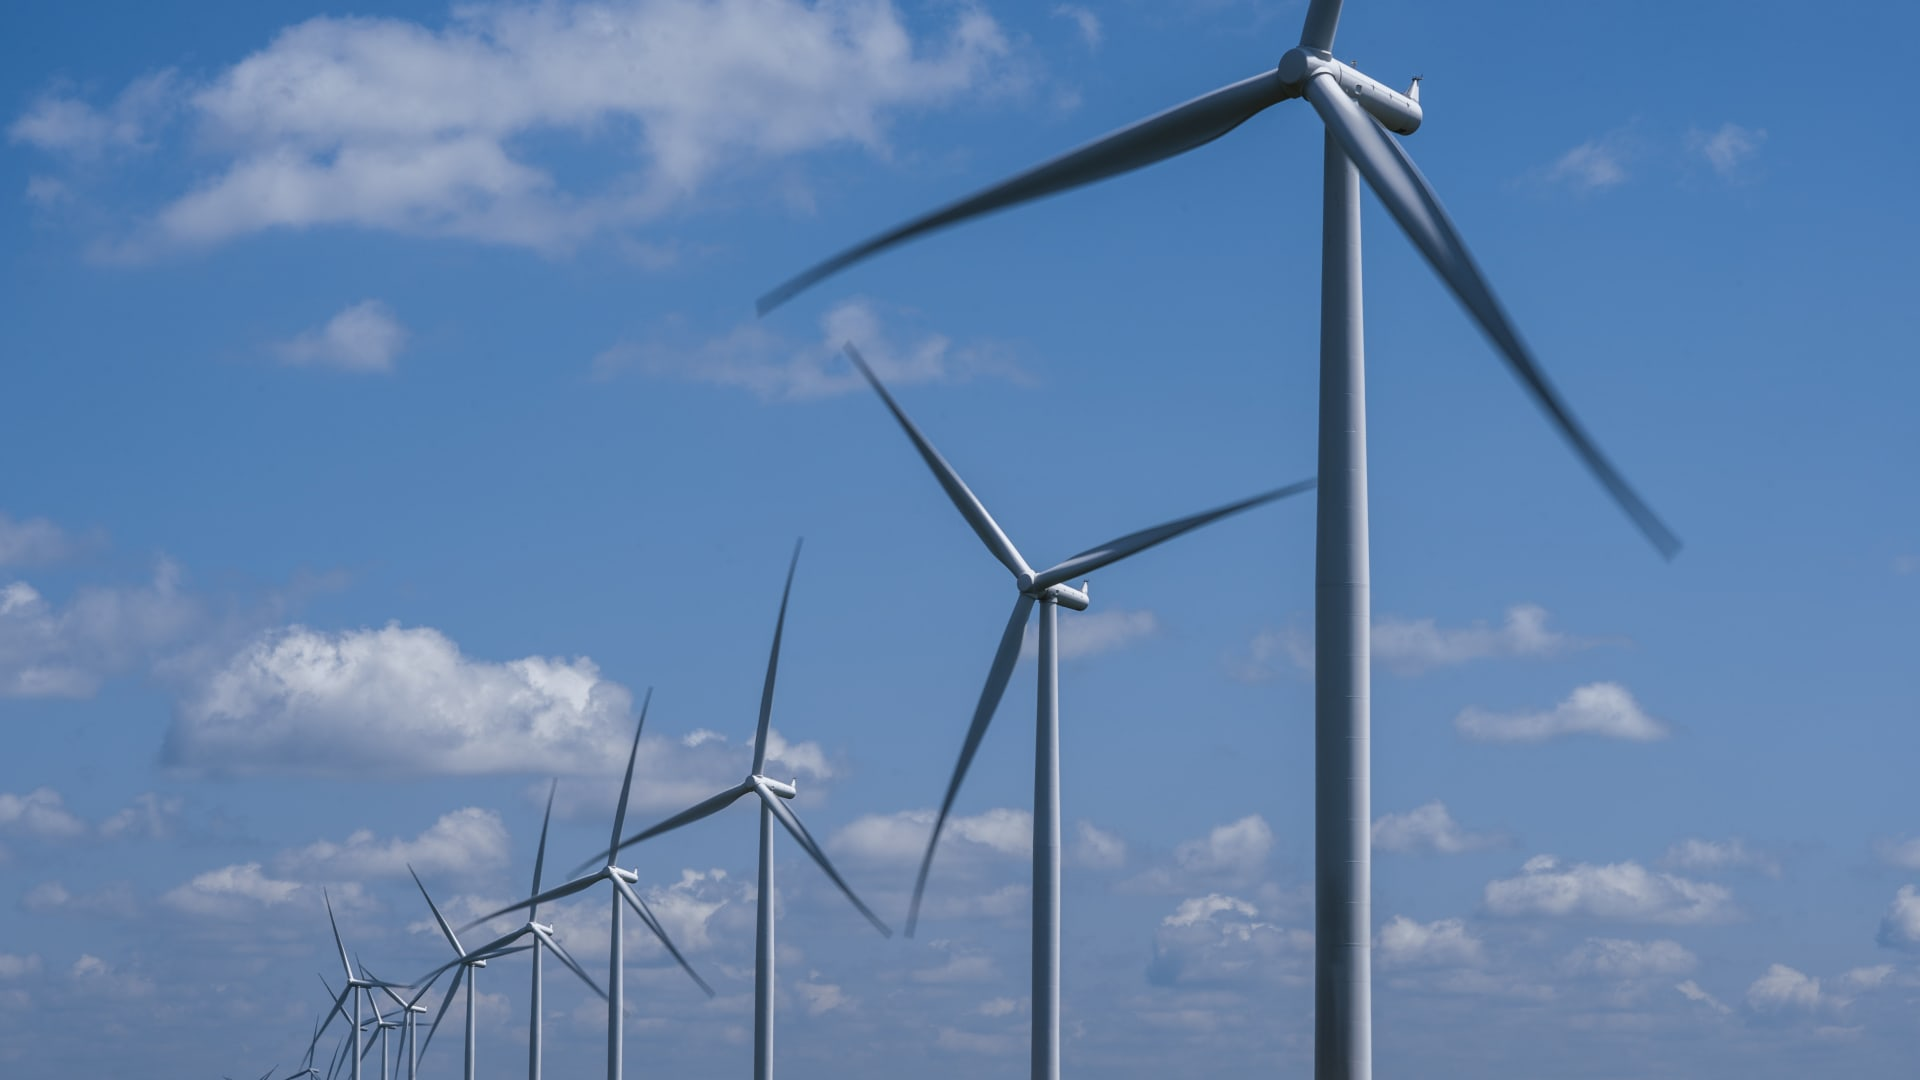 Siemens wind turbines operate on a wind farm in Marshalltown, Iowa, managed Berkshire Hathaway Energy's MidAmerican Energy.